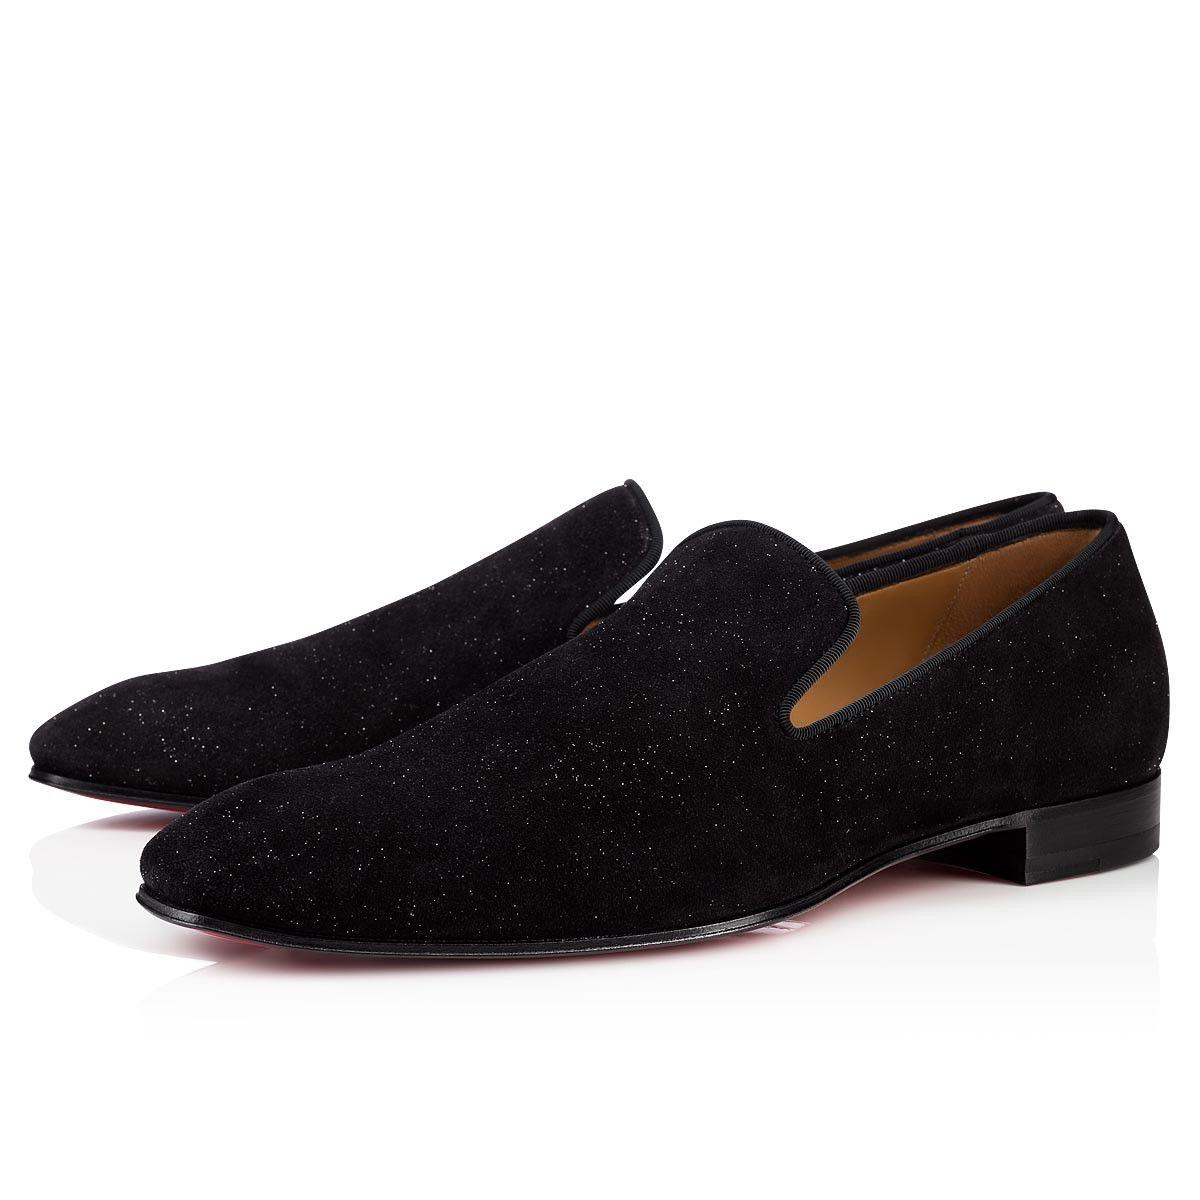 4431ee3b30 Dandelion Black Crosta Star - Men Shoes - Christian Louboutin | ch ...